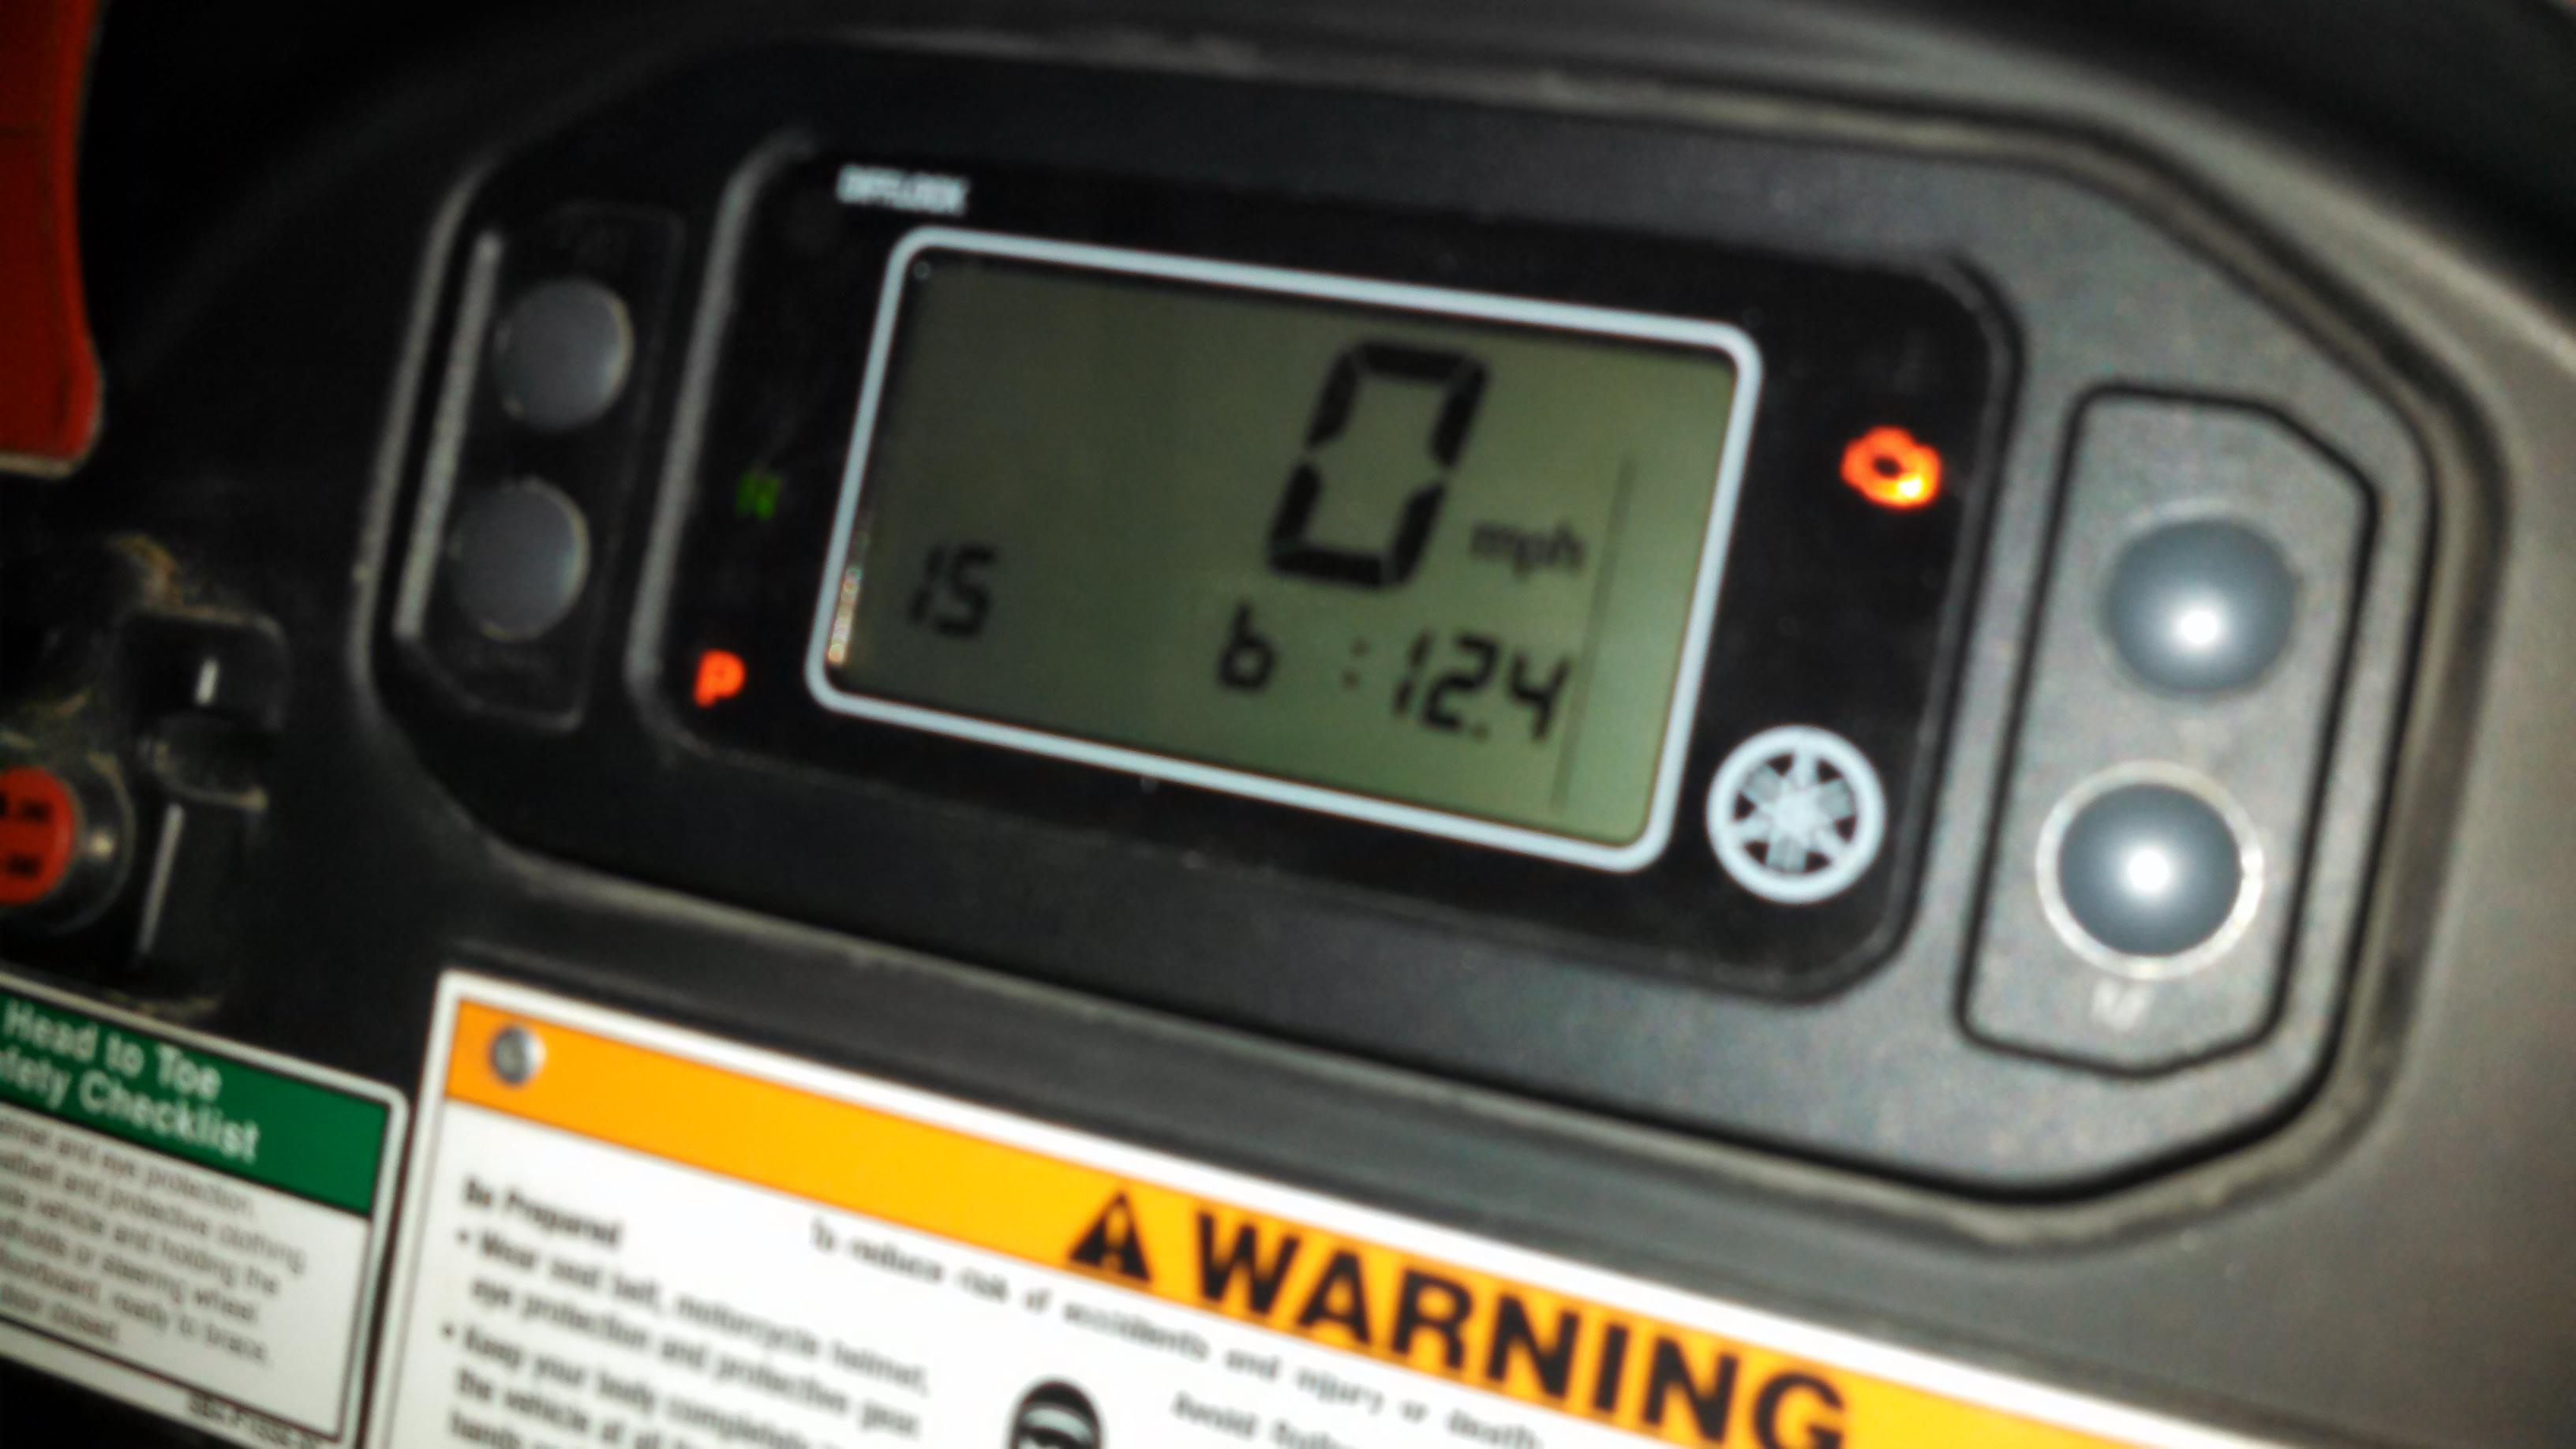 Yamaha Rhino Diagnostic Codes